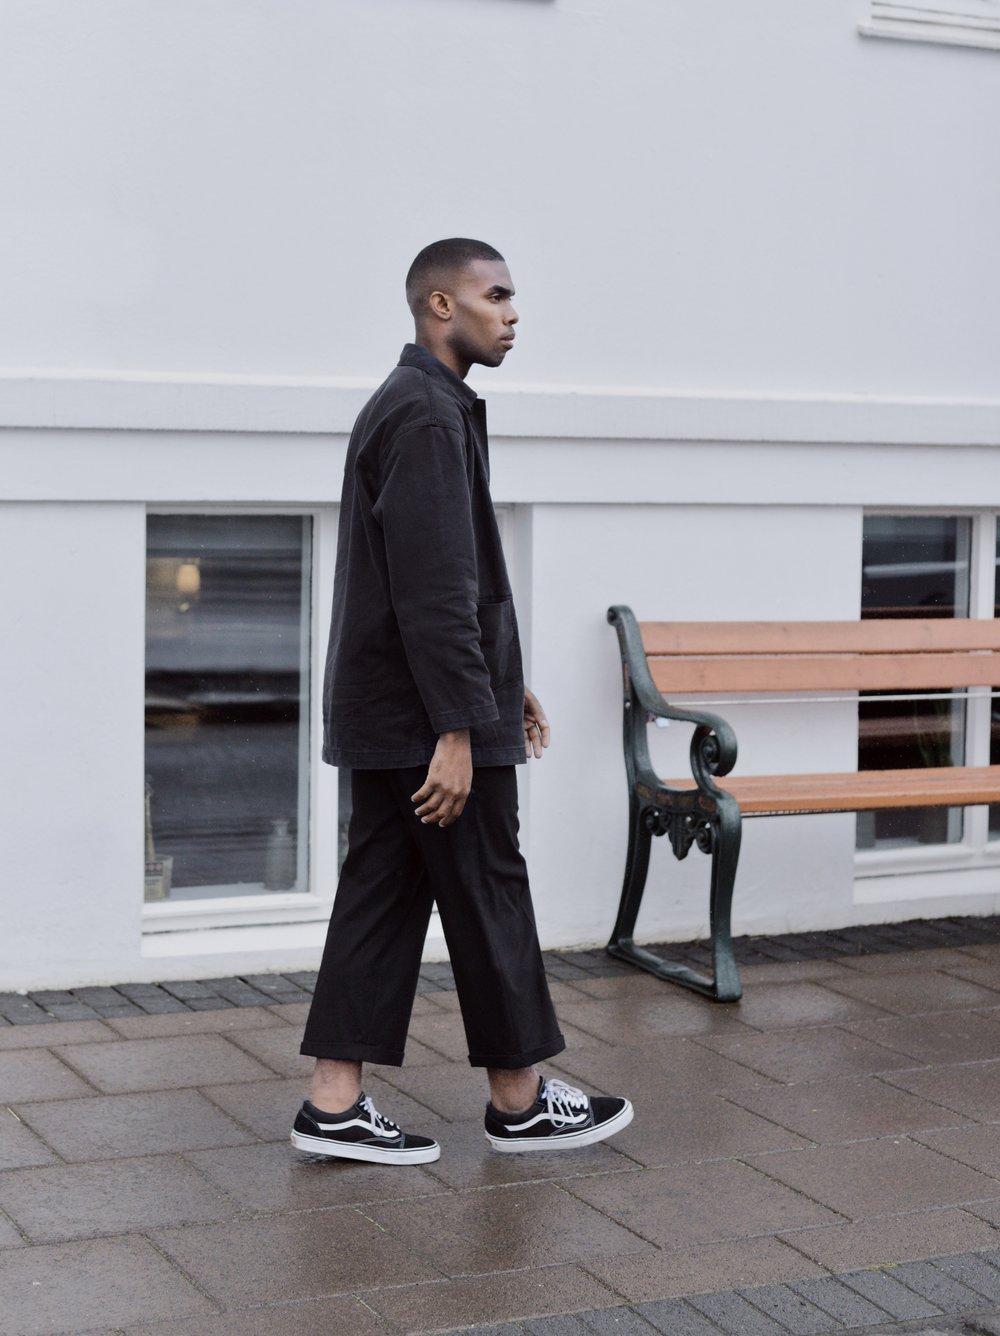 The-Look-Principle-Oversized-Worker-Style-In-Reykjavik-2.jpg